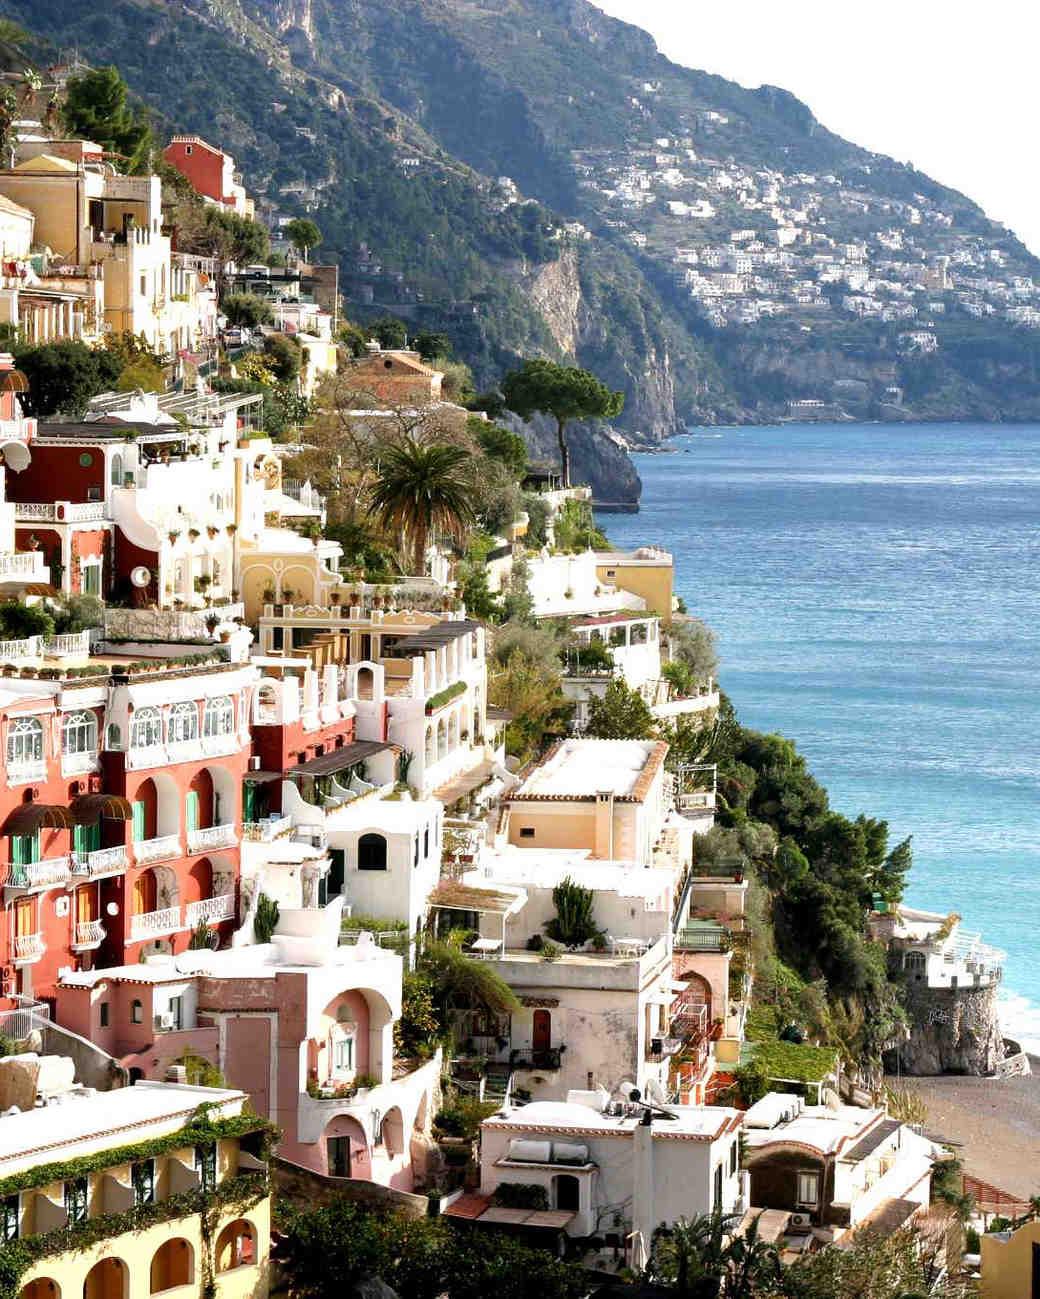 romantic place italy sorrento